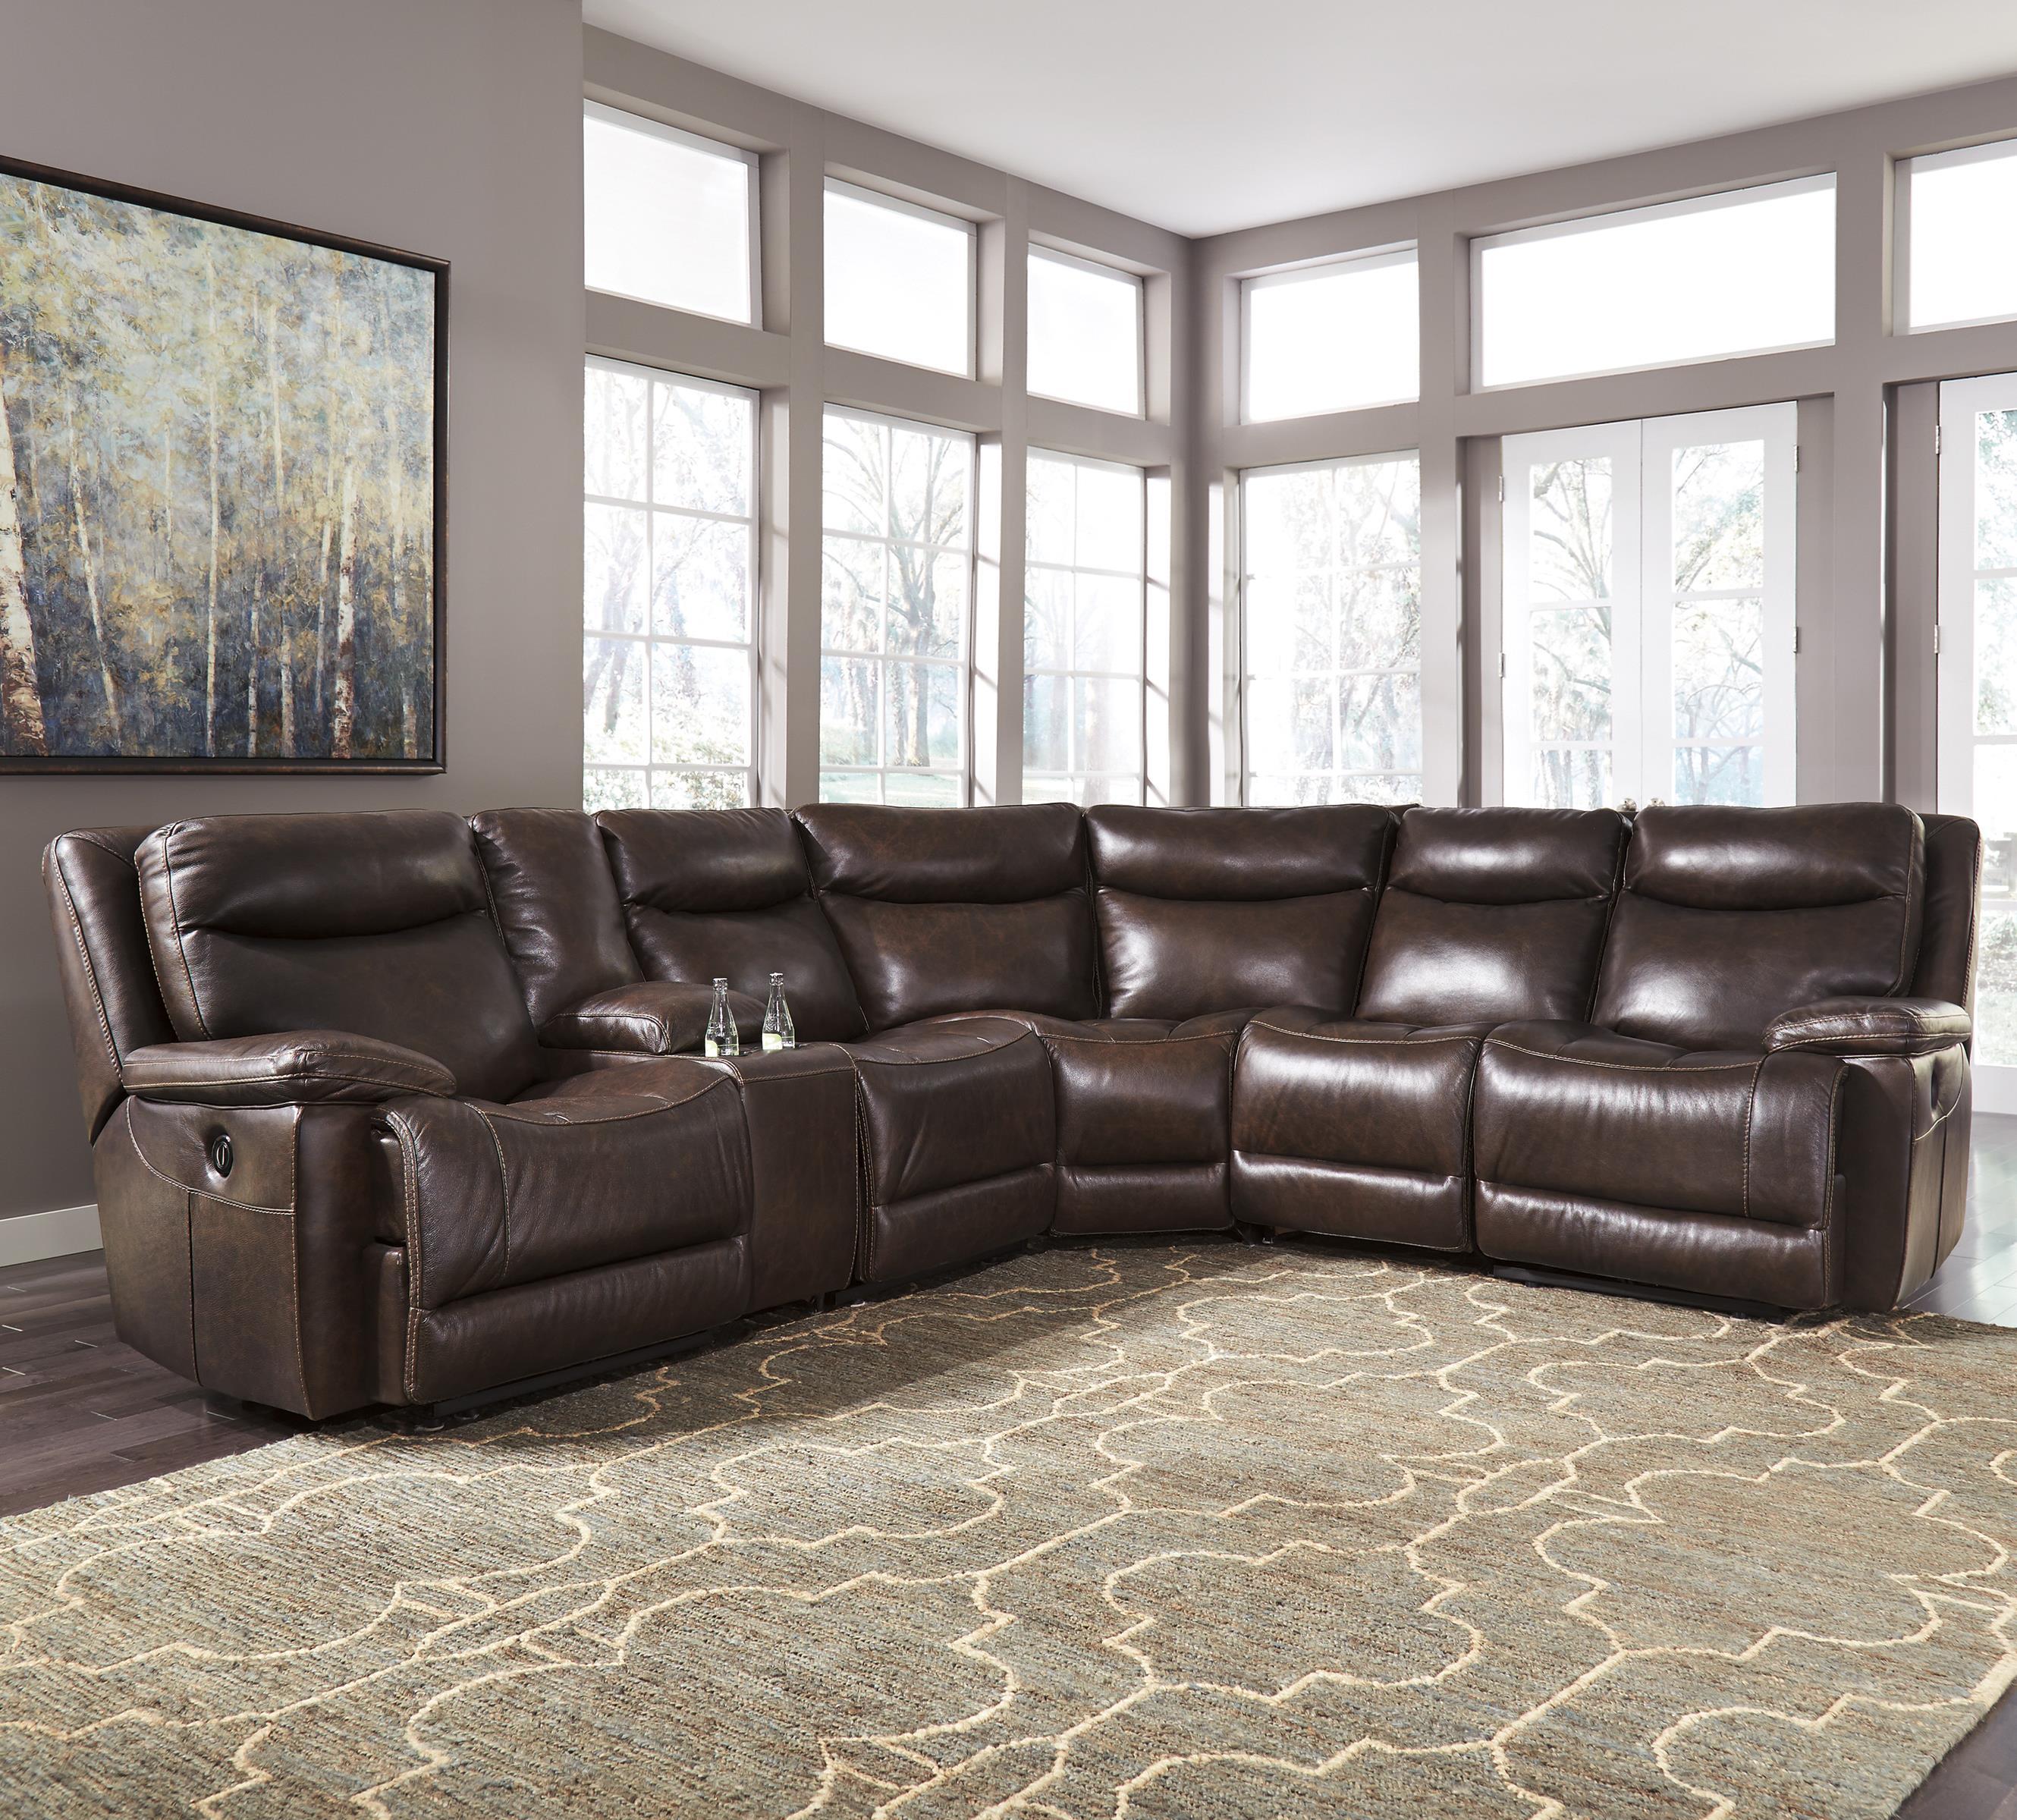 Leather Sectional Sofa Birmingham Al